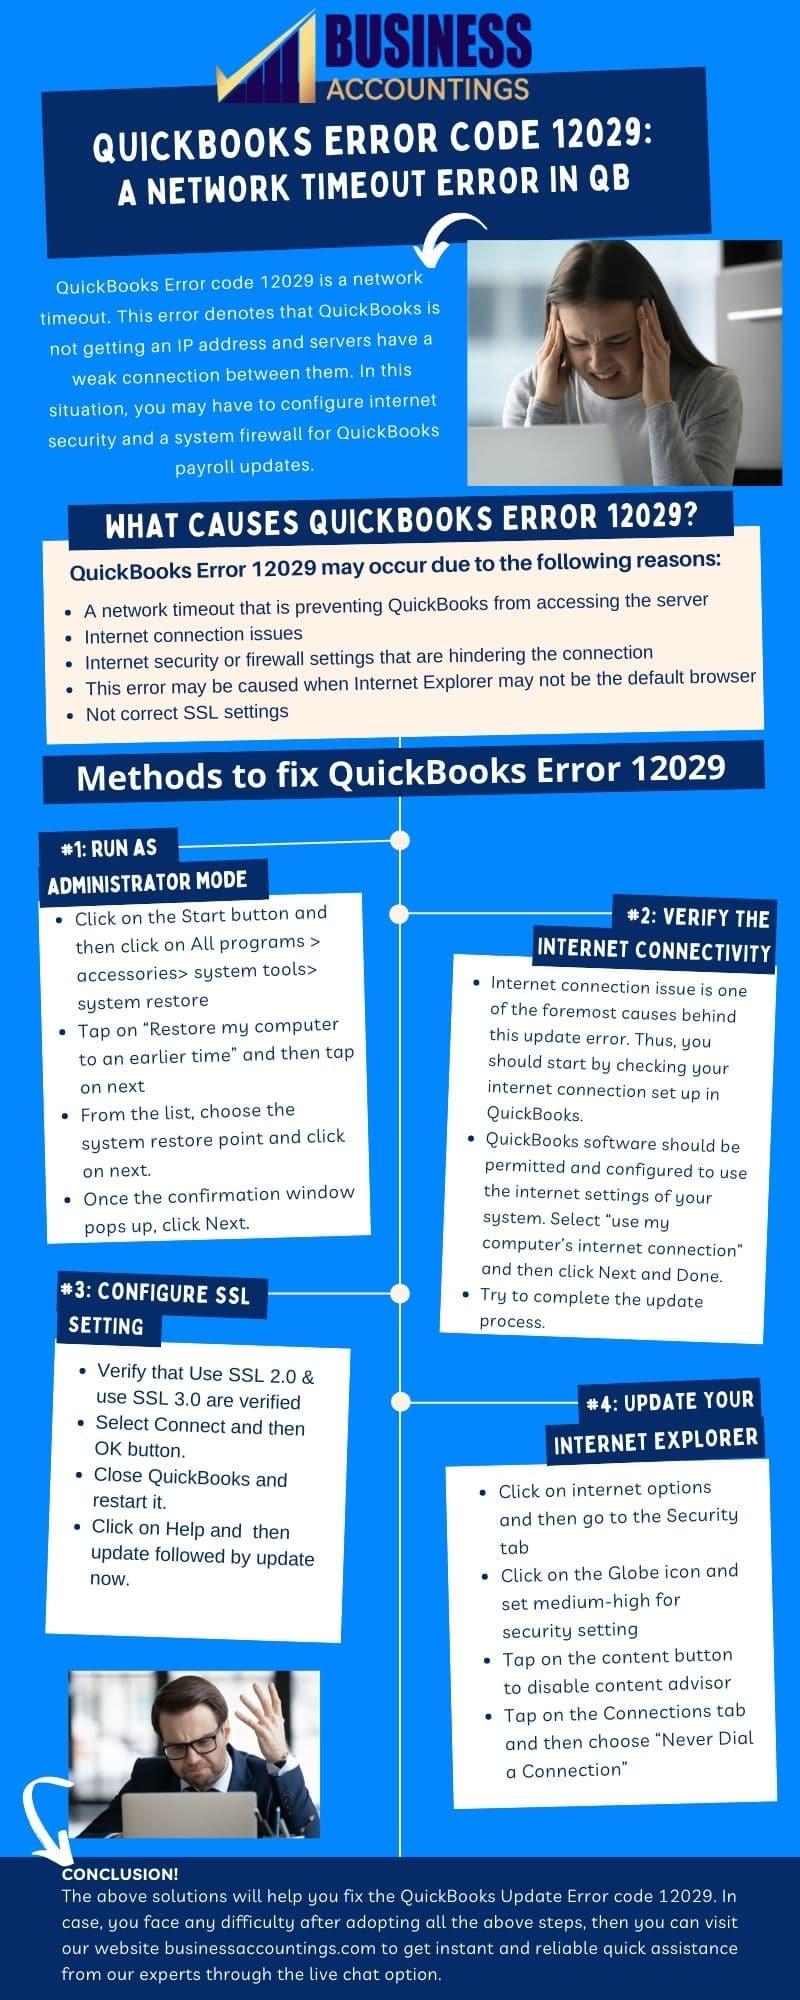 Infographics to Solutions of QuickBooks Error Code 12029